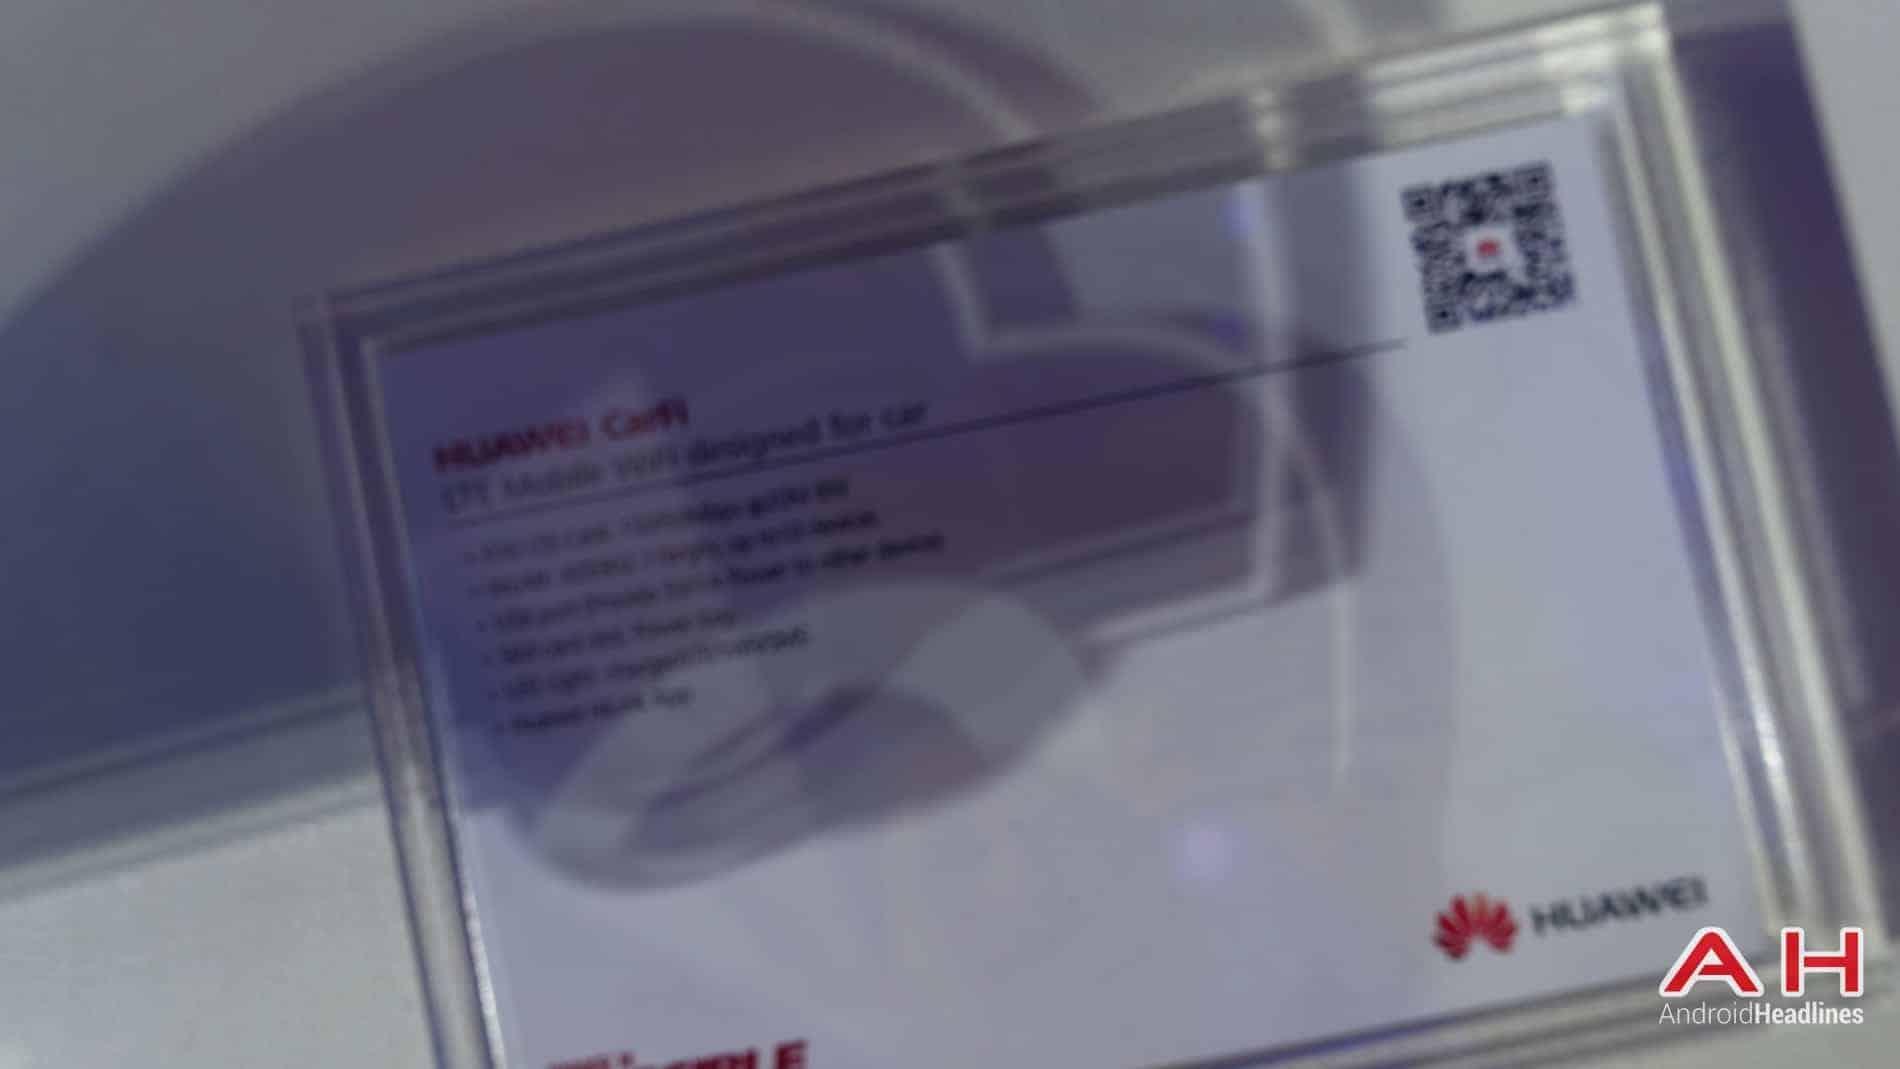 Huawei CarFi AH 05